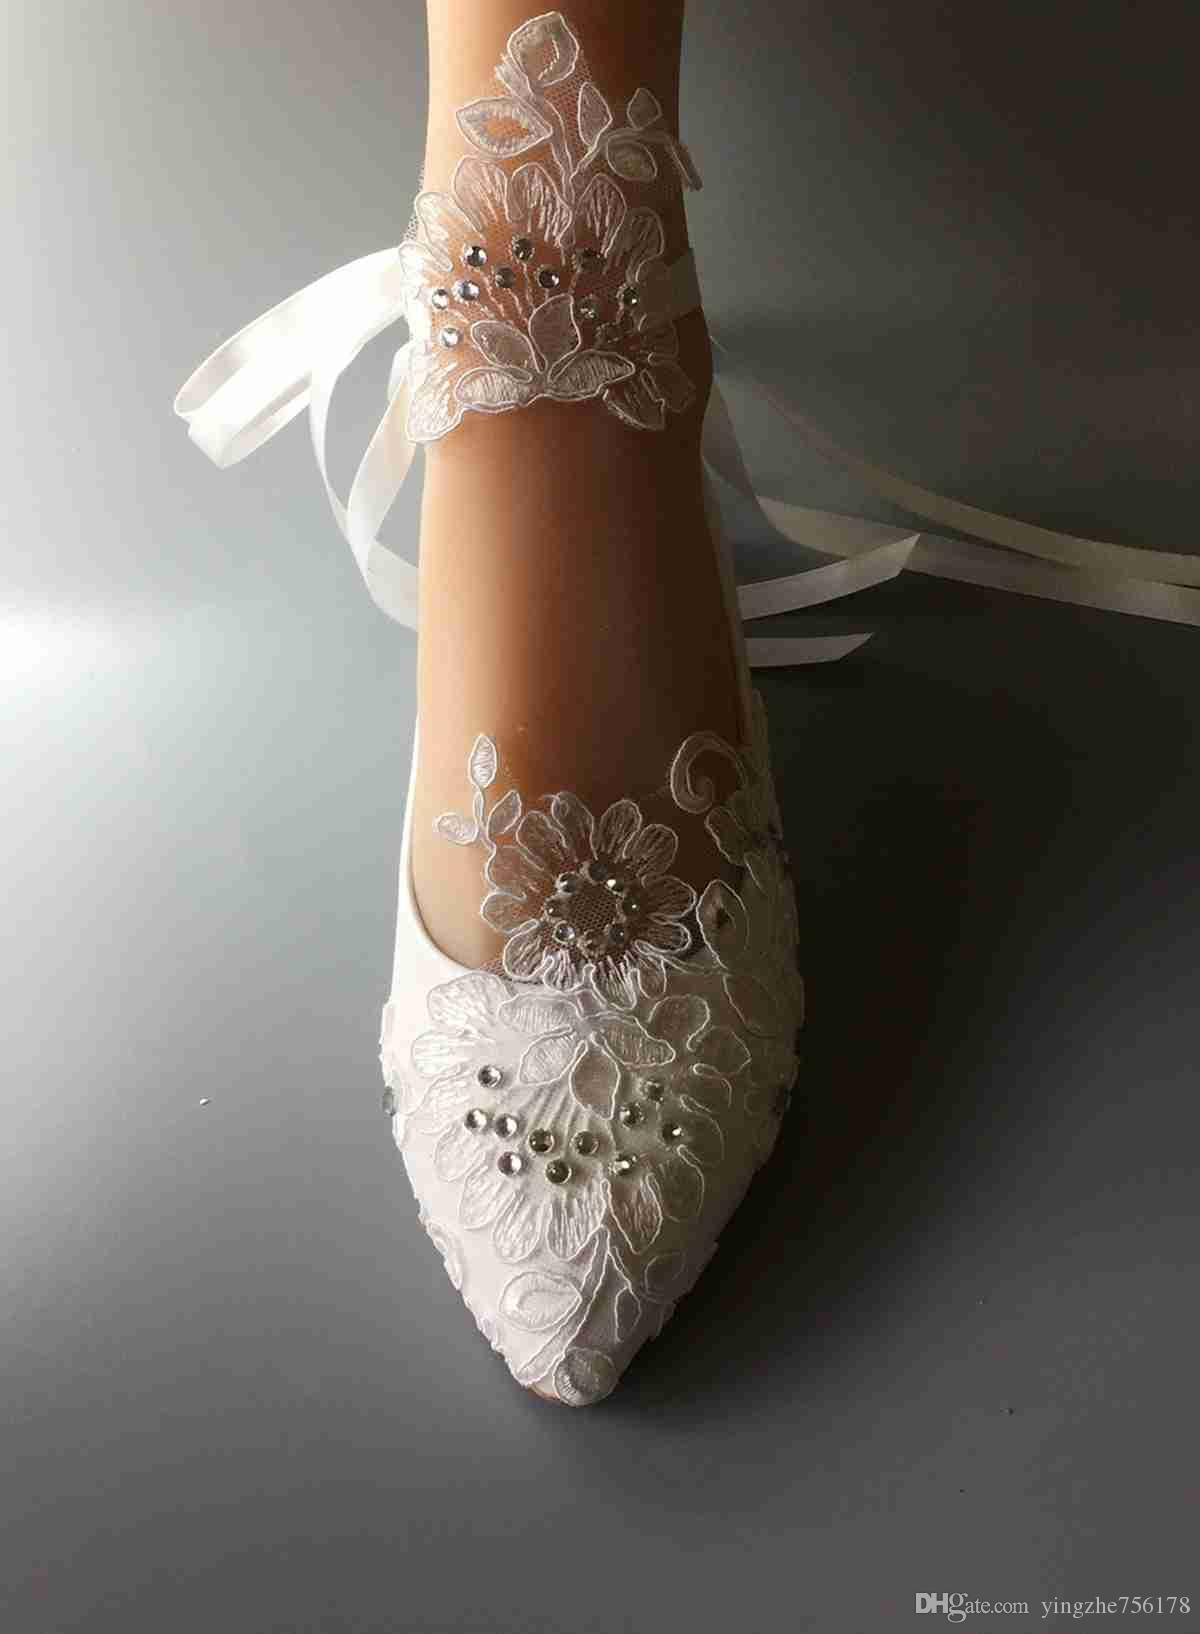 Wedding Handmade Shoes White Ribbon Bride Dresses Han Edition Diamond Lace Manual Flat Shoe Female Flower Eu 35 41 Silver Wedge: Dress Flat Wedding Shoes At Websimilar.org